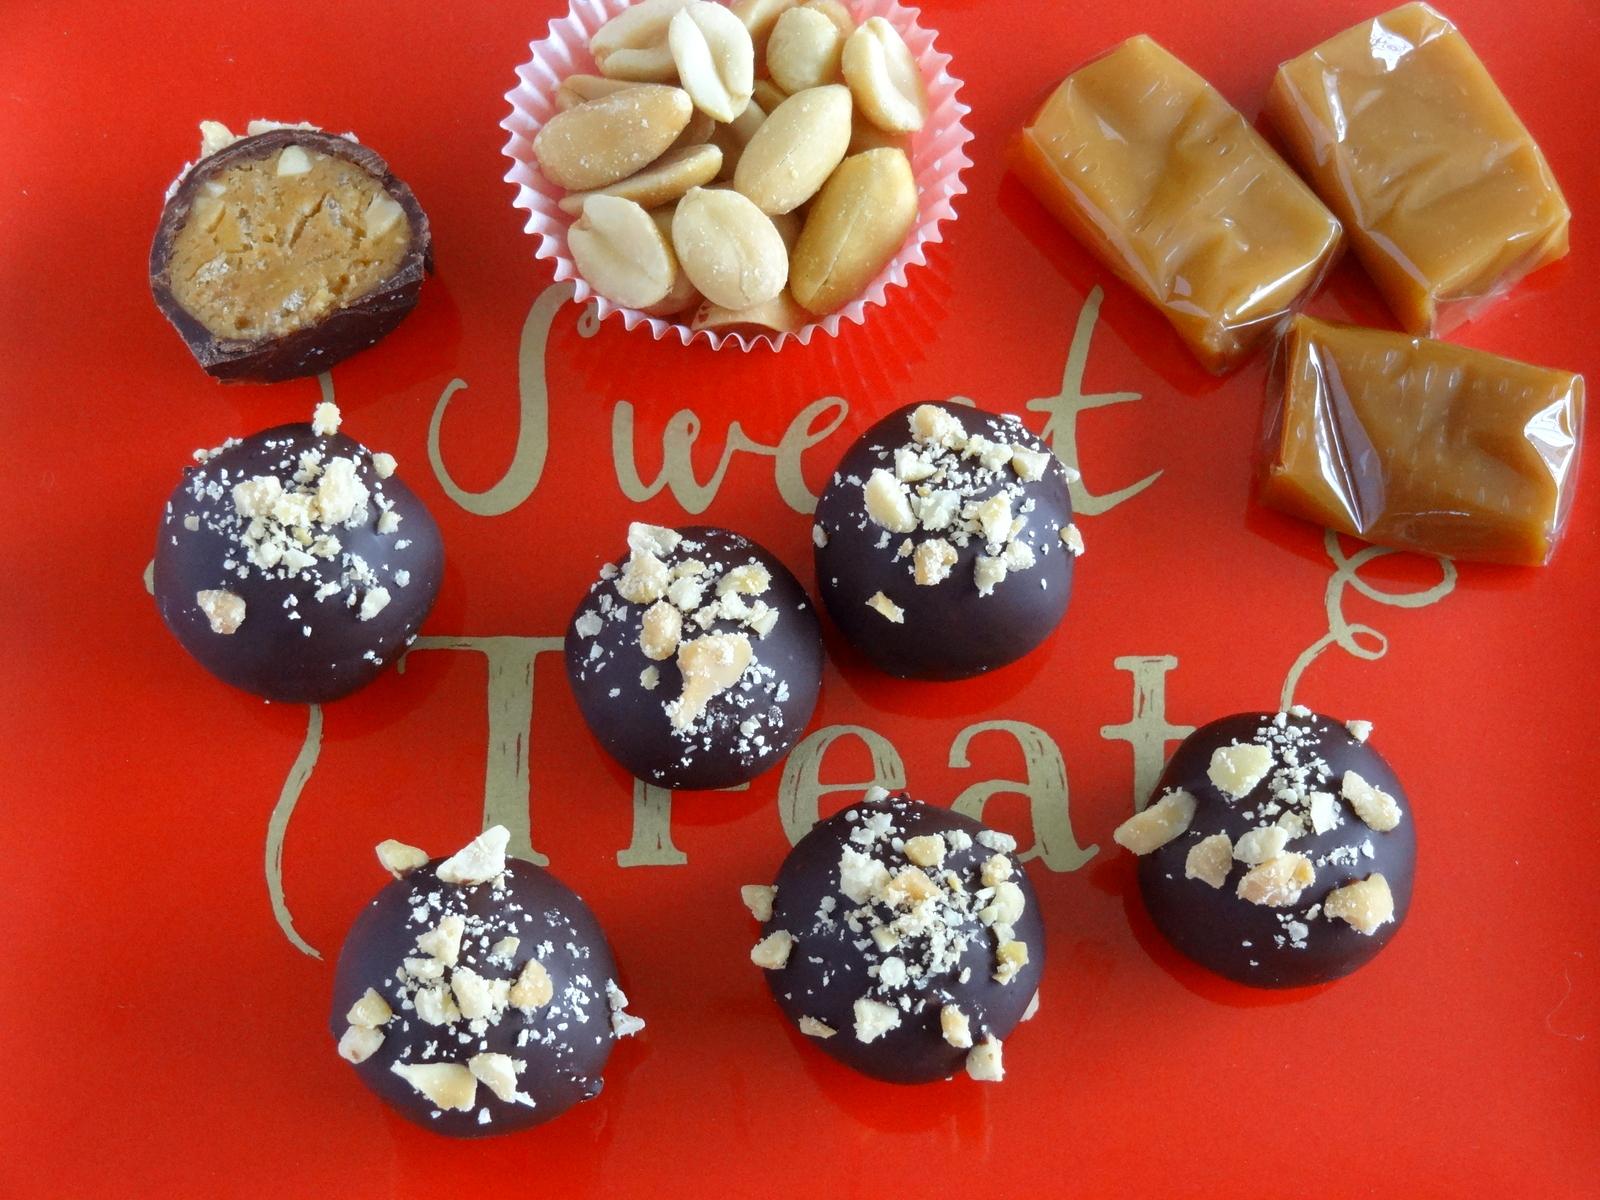 peanut caramel rice krispies candies